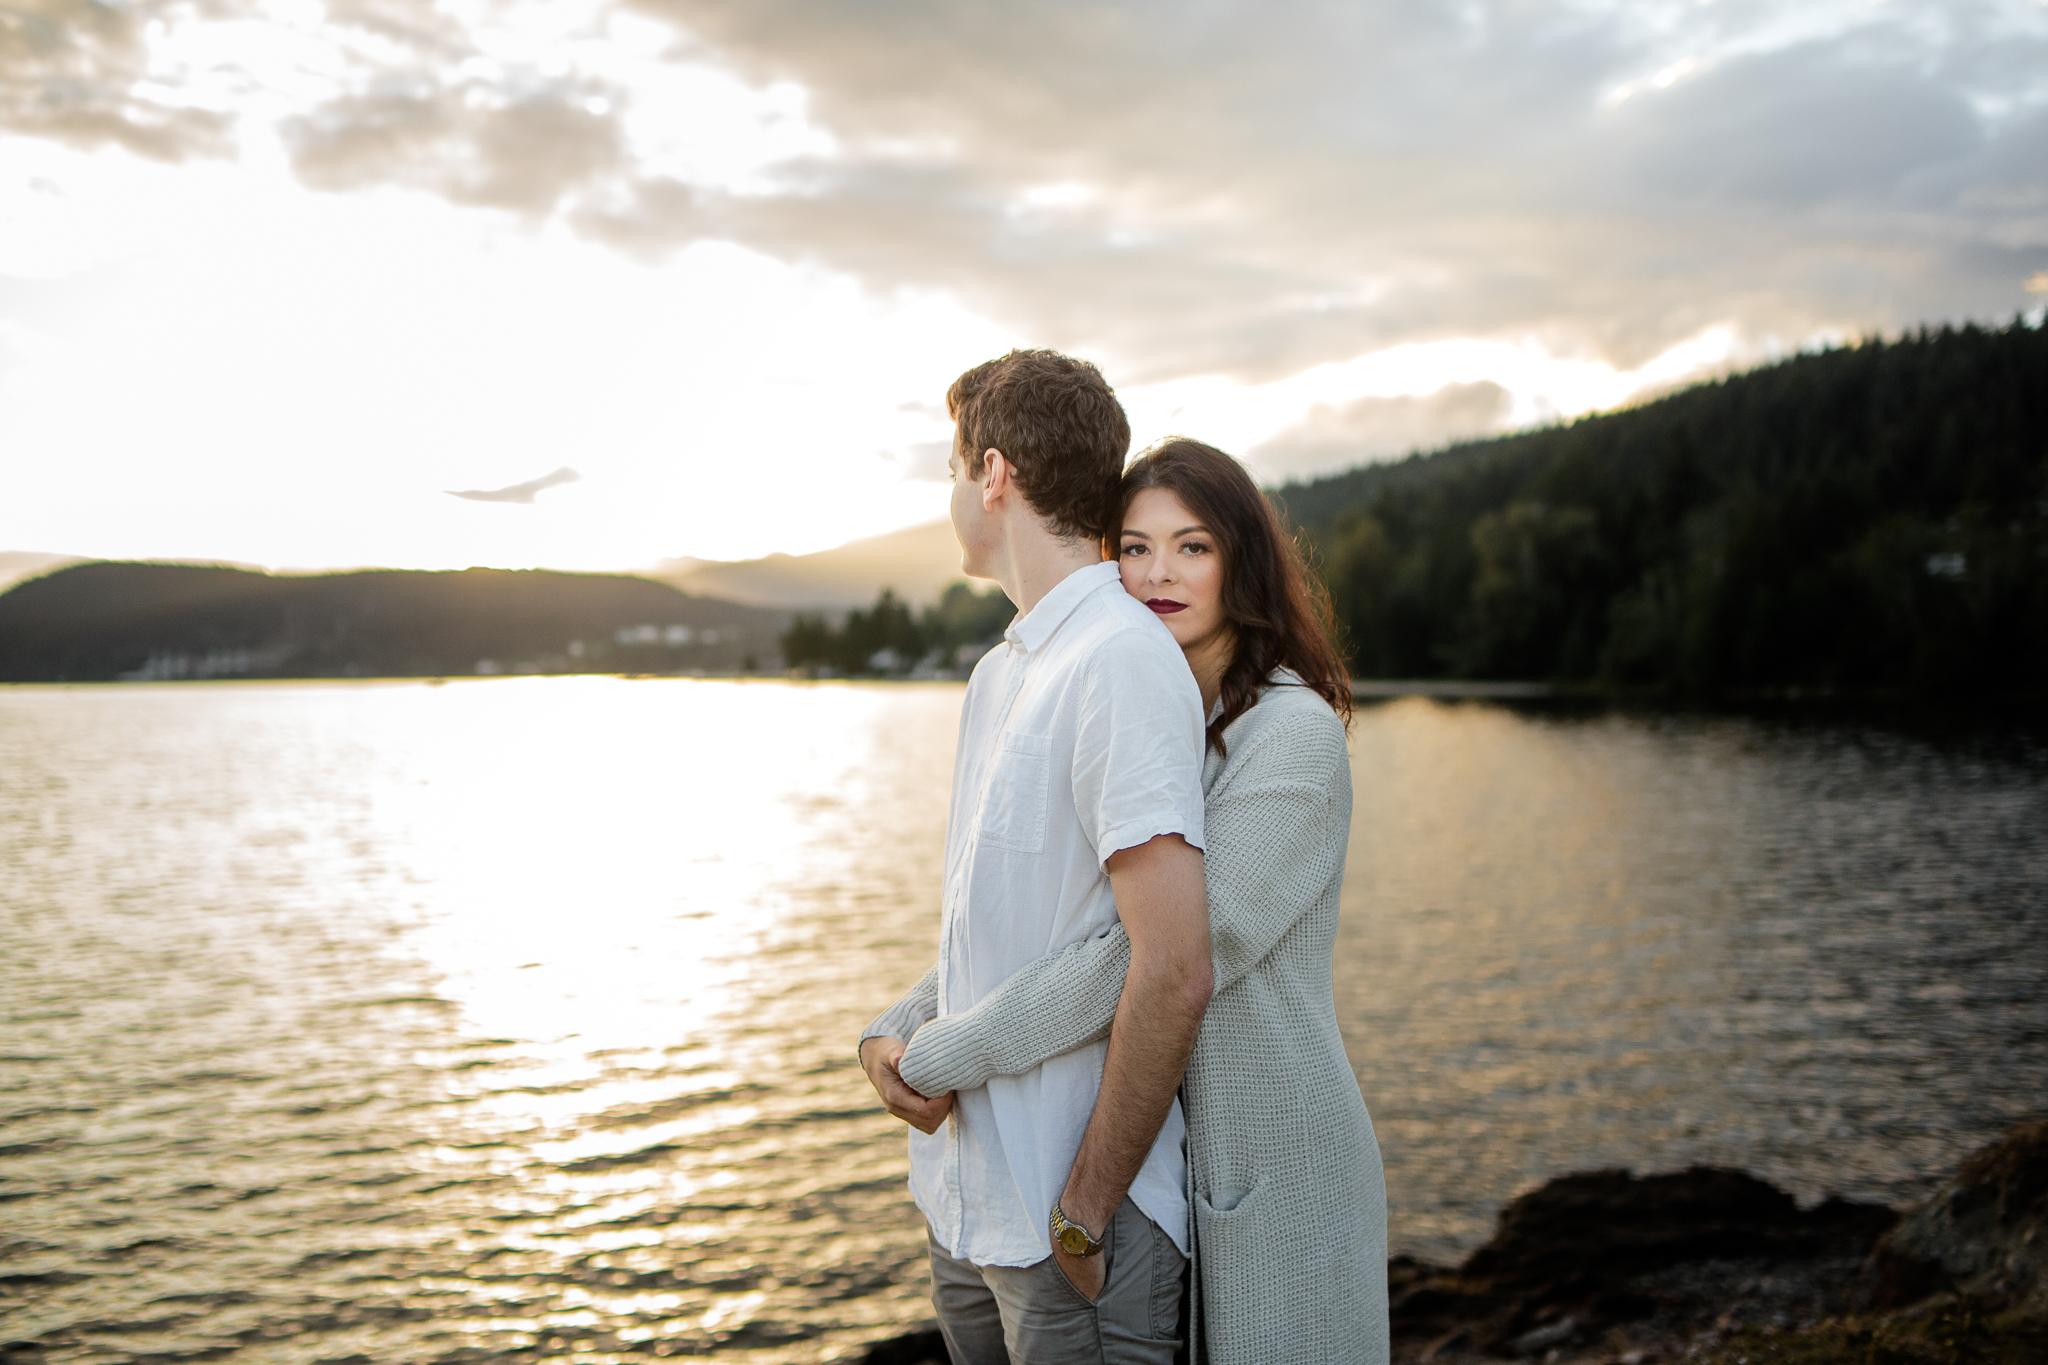 Photo of Buntzen Lake Anmore British Columbia Landscape Best Fun Engagement Photographer Port Moody Wedding Sunset Romantic Couple Photos 189.jpg